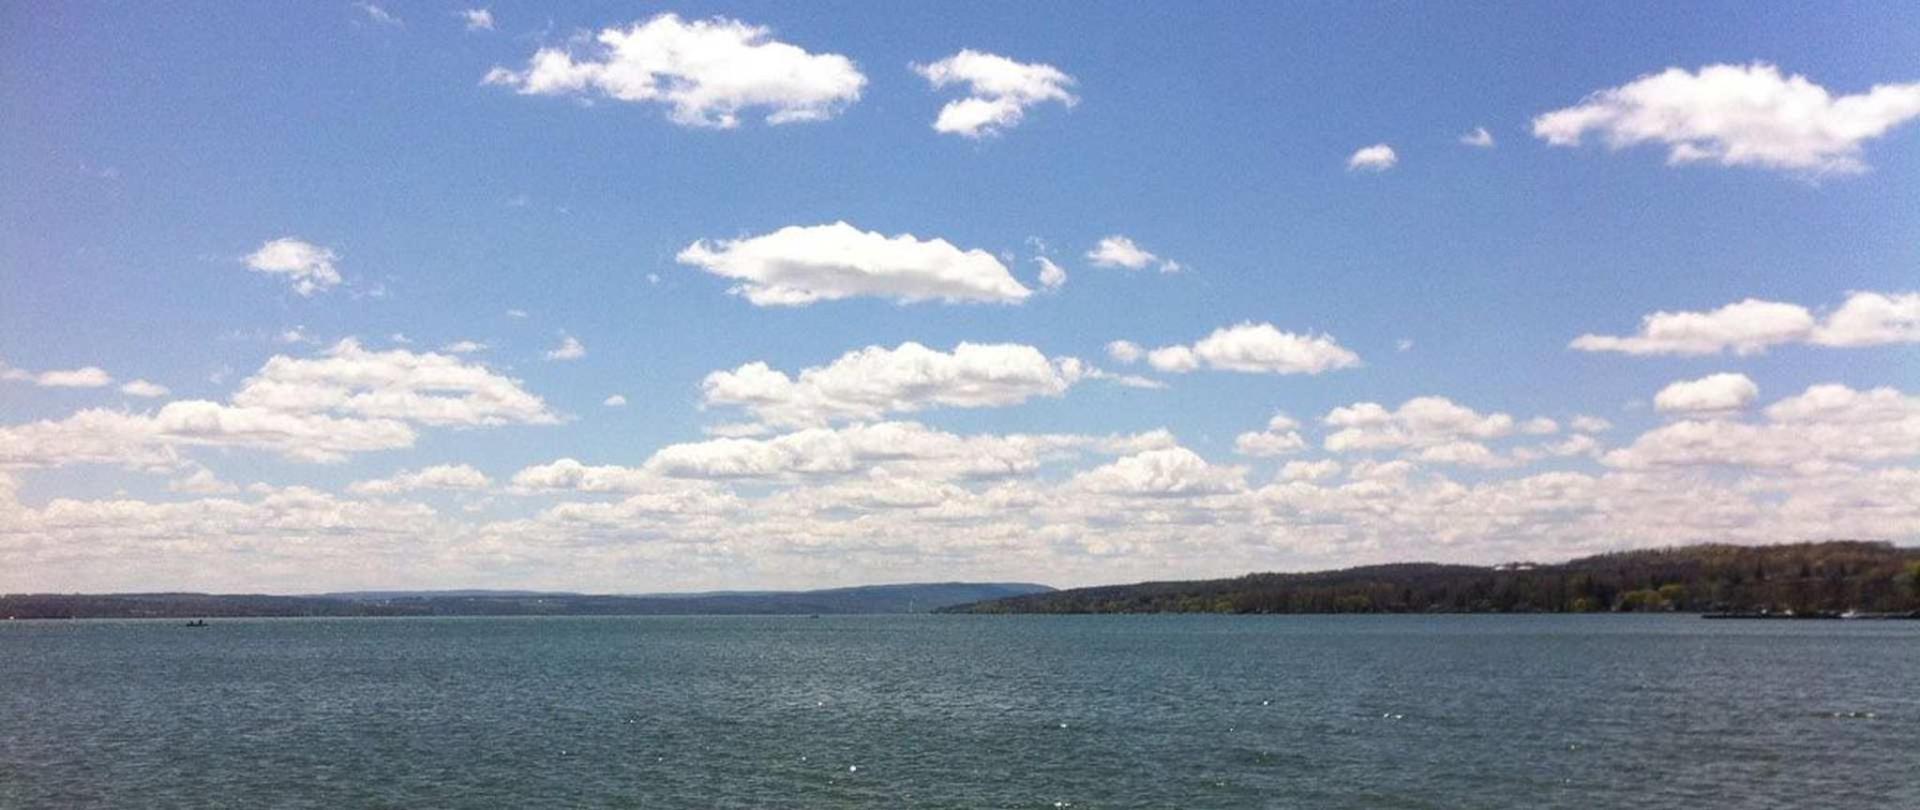 canandaigua-lake-at-kershaw-park-in-the-finger-lakes.jpg.1920x810_0_57_15999.jpeg